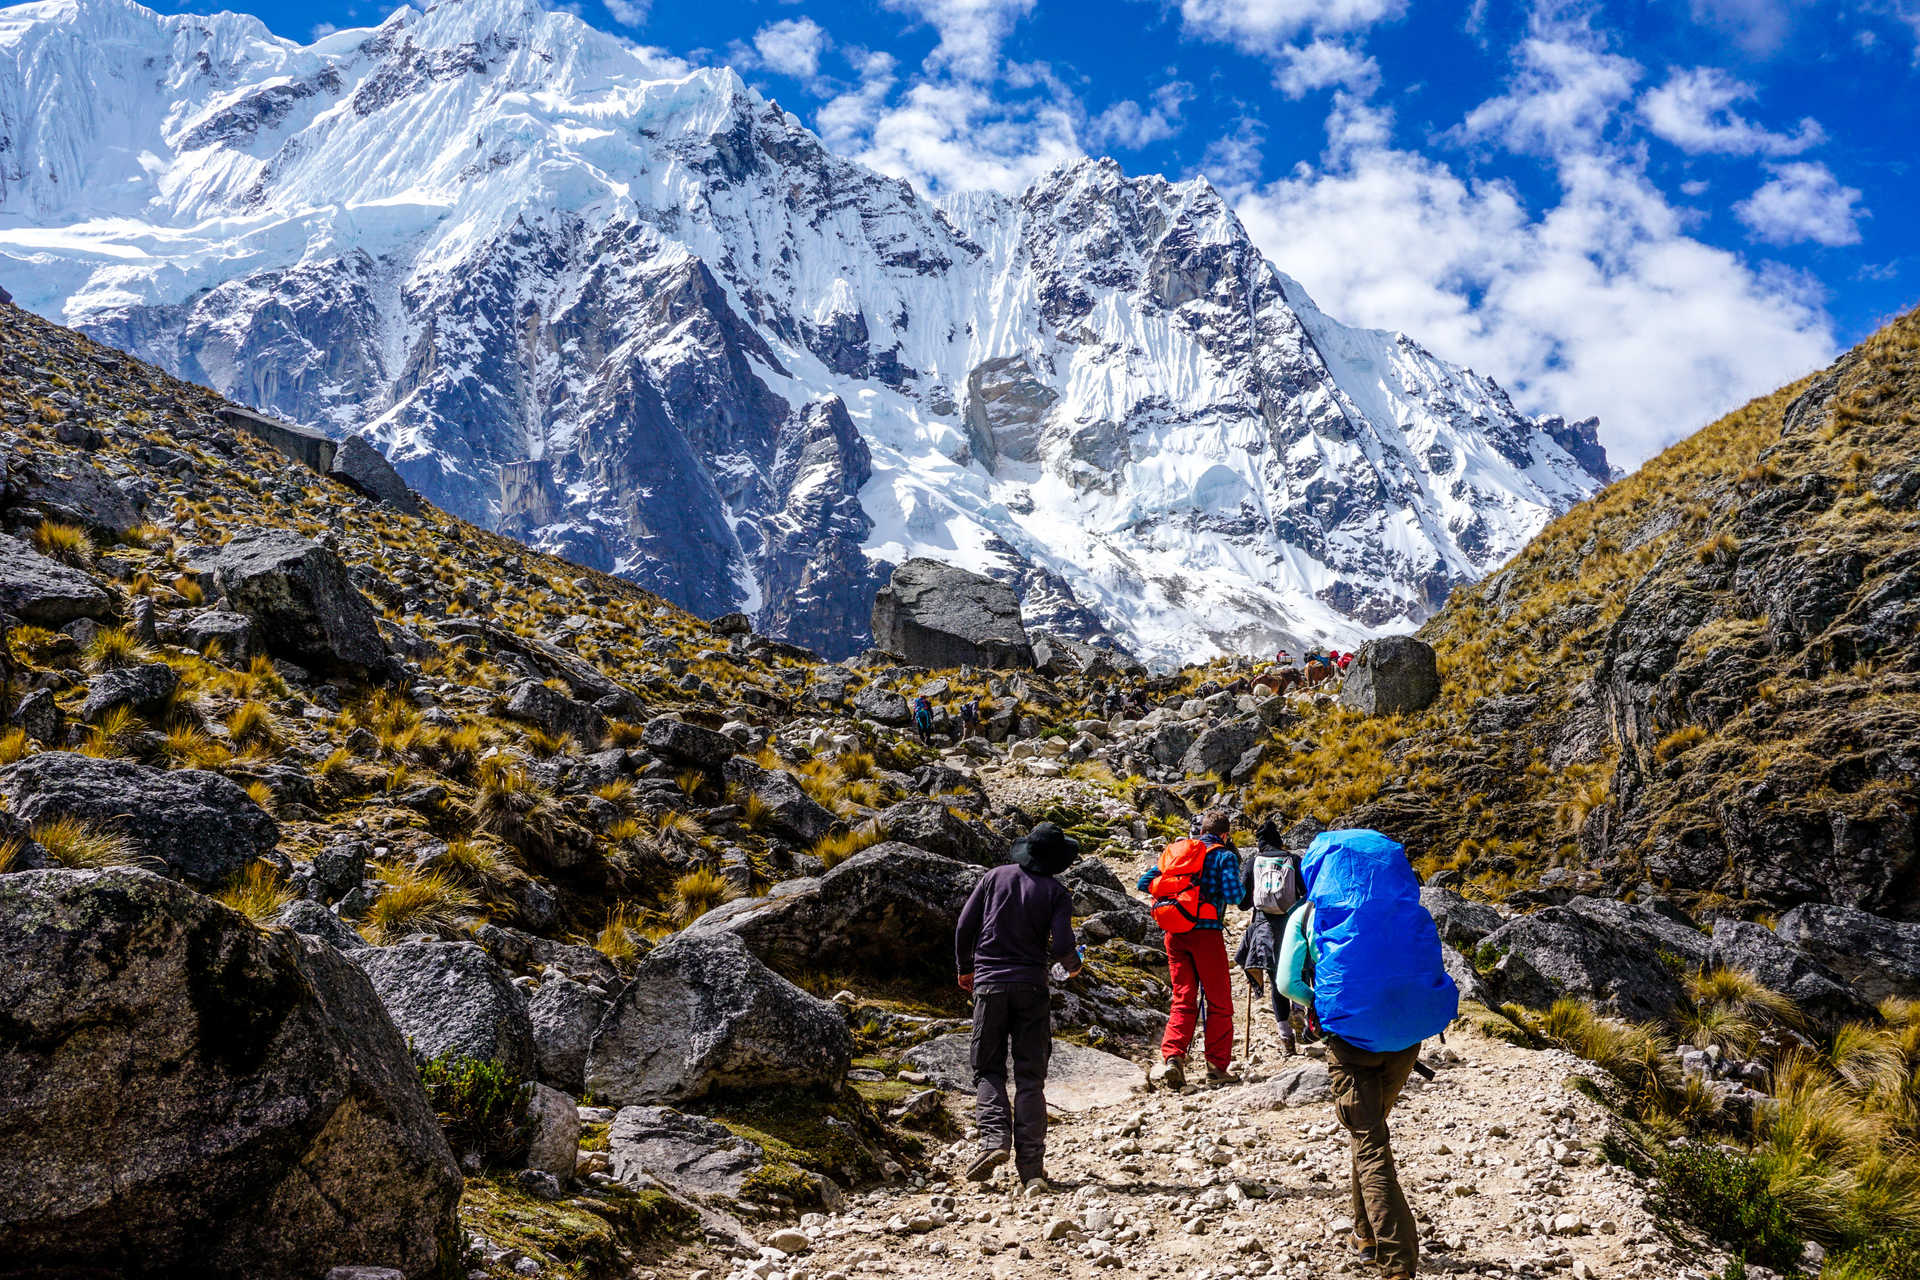 Hikers cimbing to the Salkantay pass